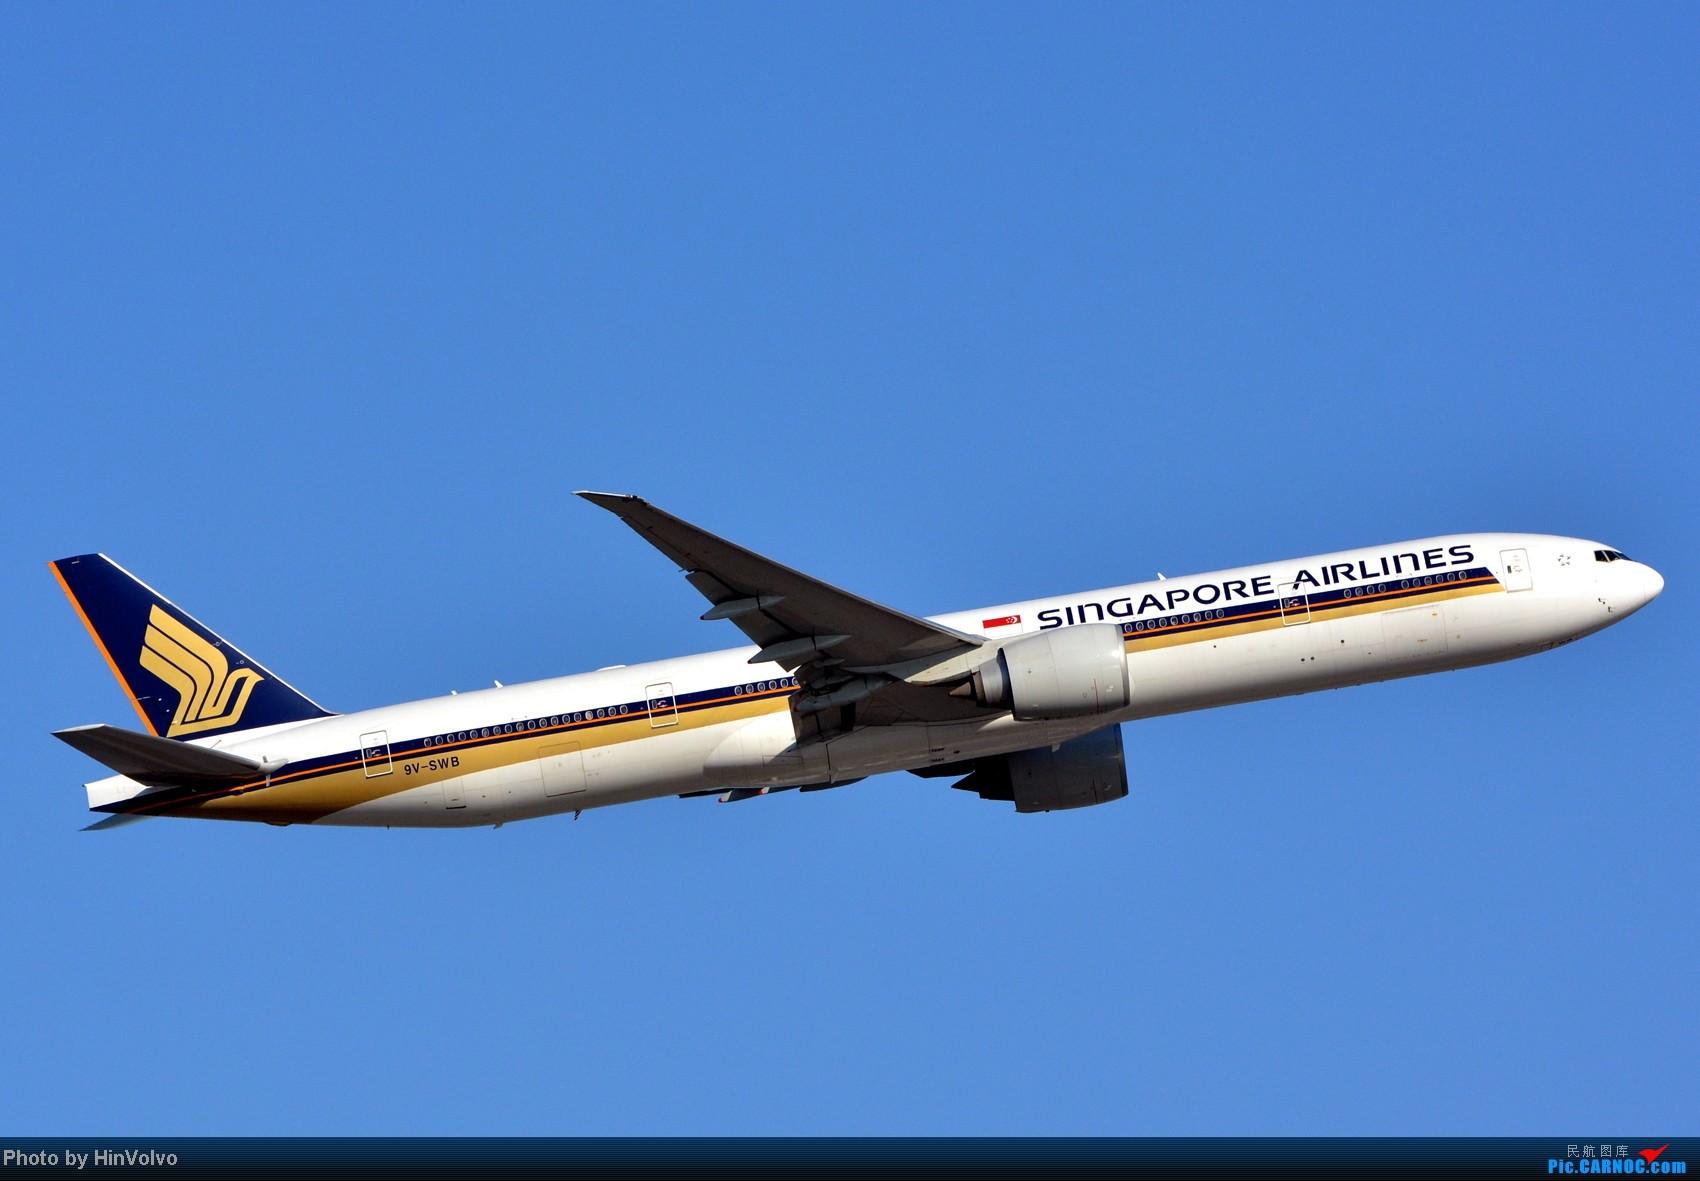 Re:[原创]~~~~多圖系列~~~HKG,早上好!寒冷的天氣出發前往機場拍到中午。 BOEING 777-300ER 9V-SWB 中国香港赤鱲角机场